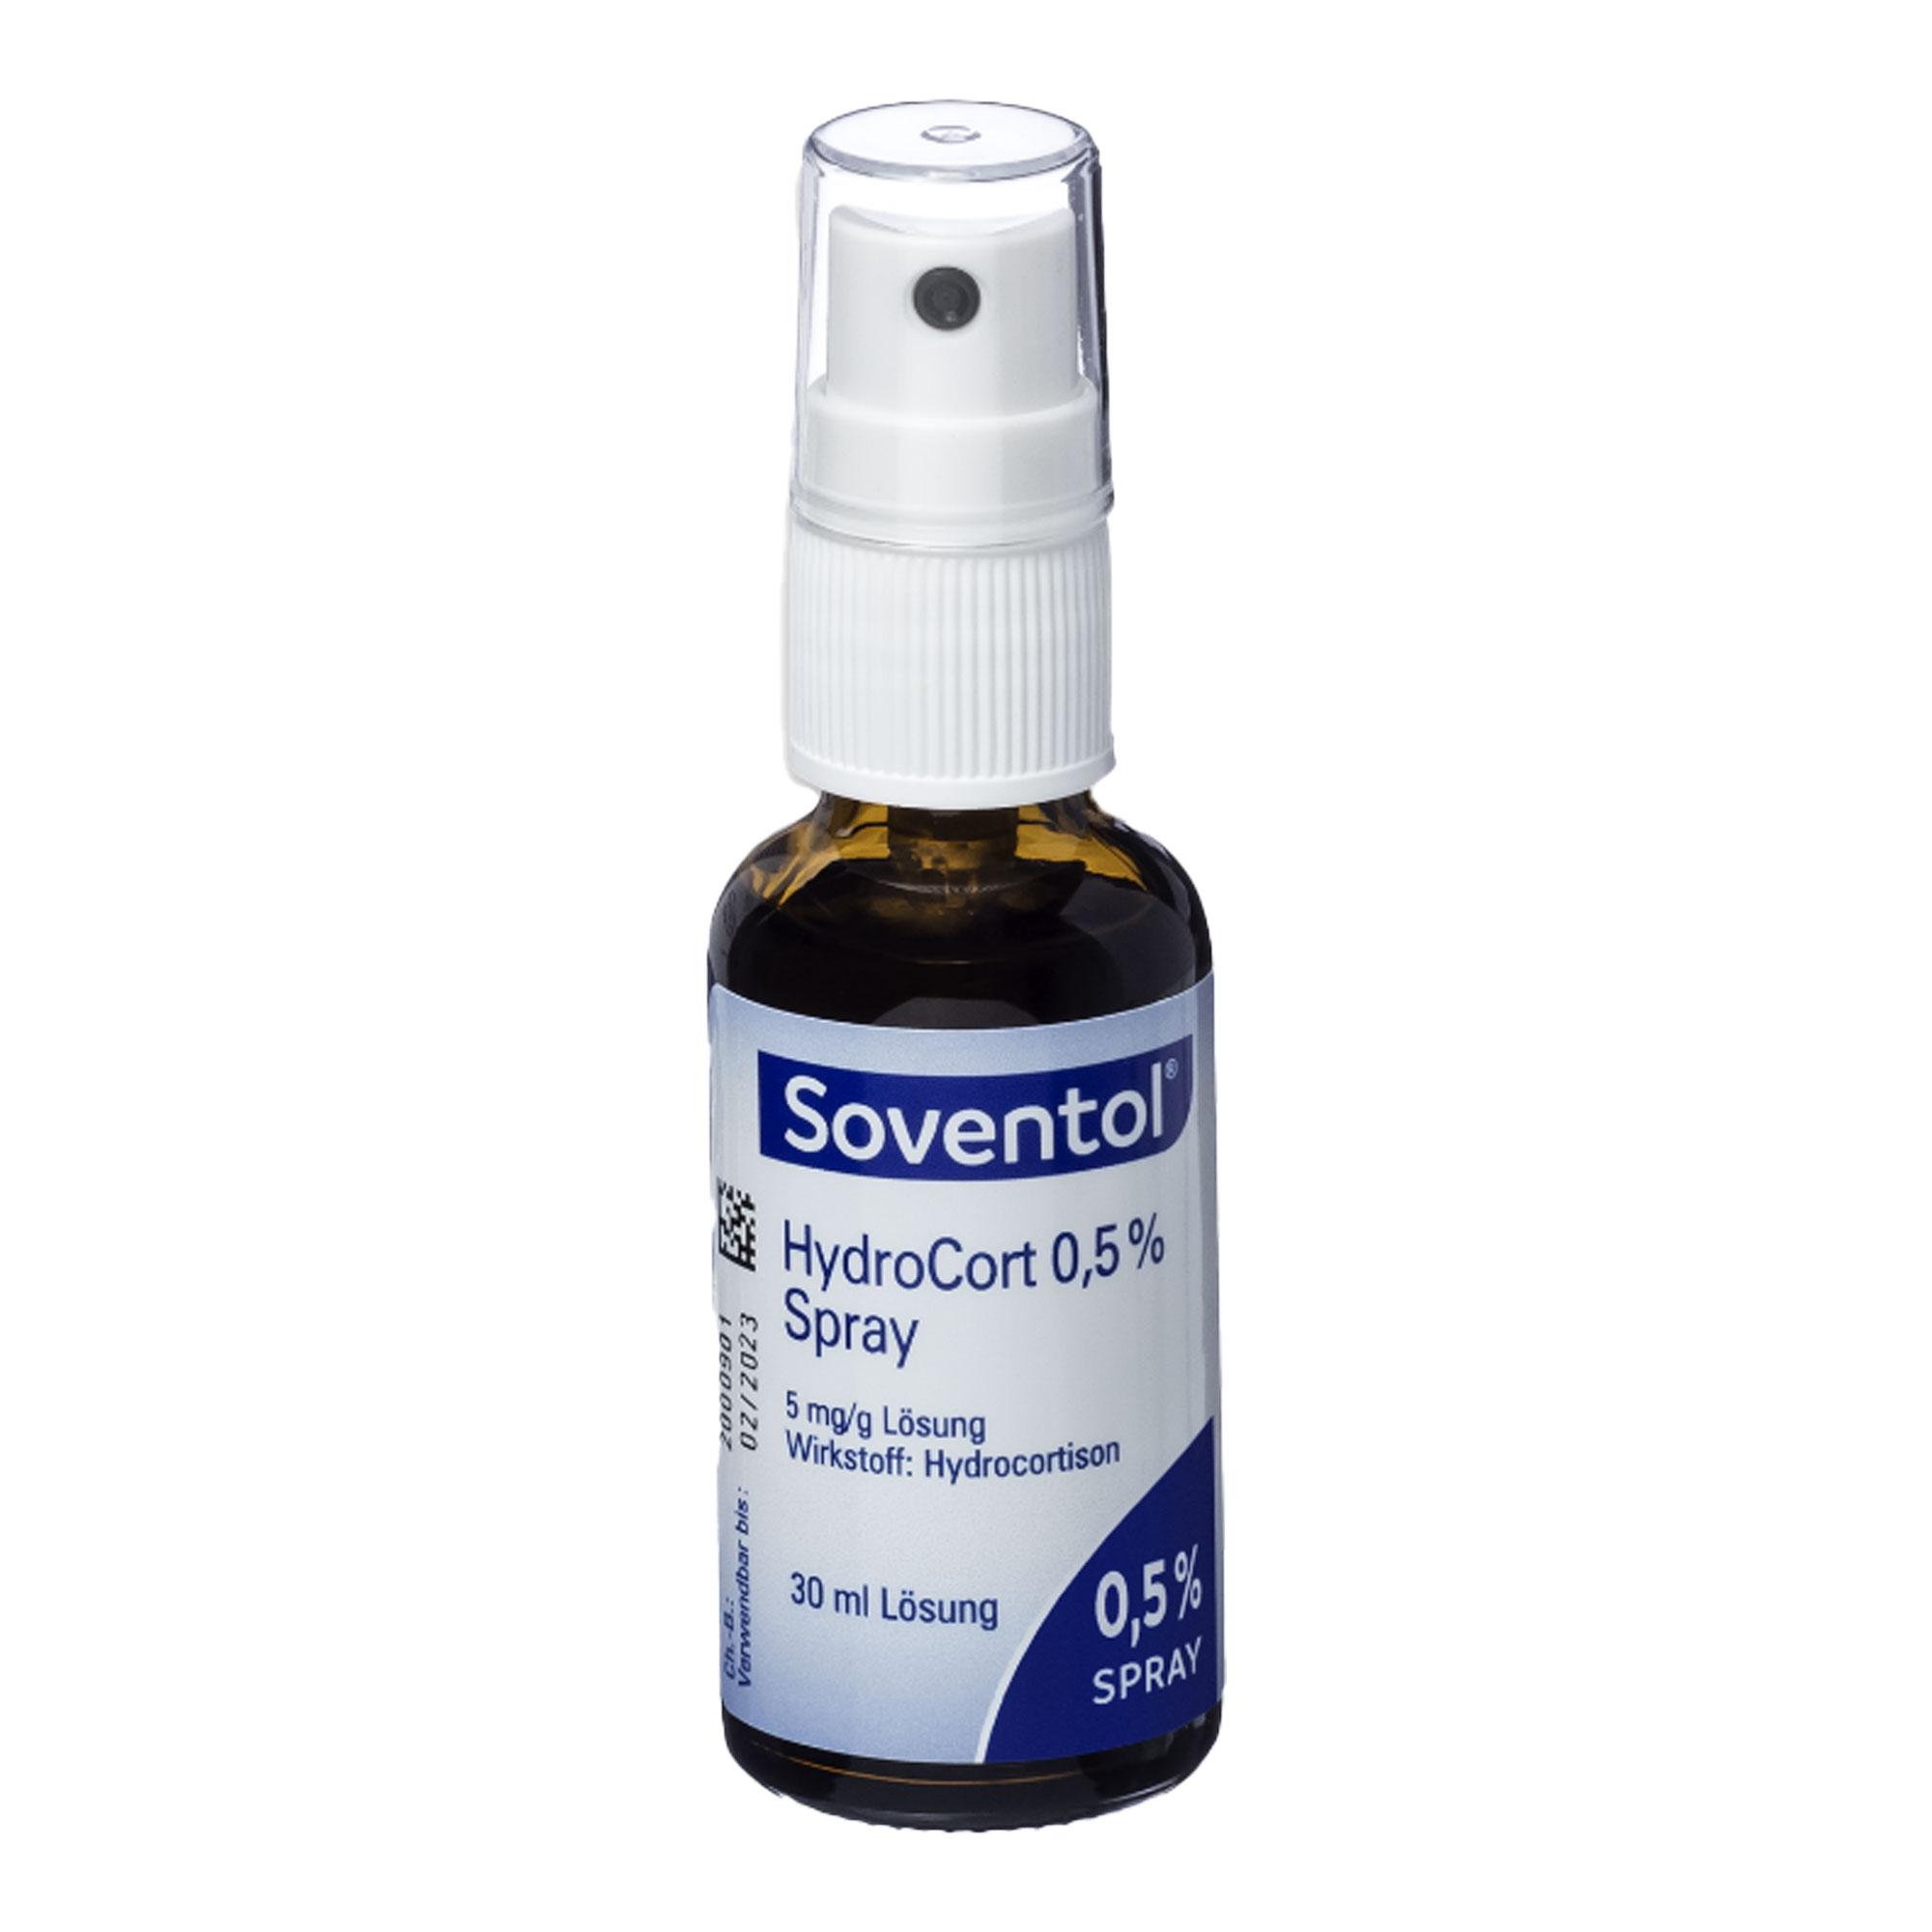 Soventol HydroCort 0,5 % Spray